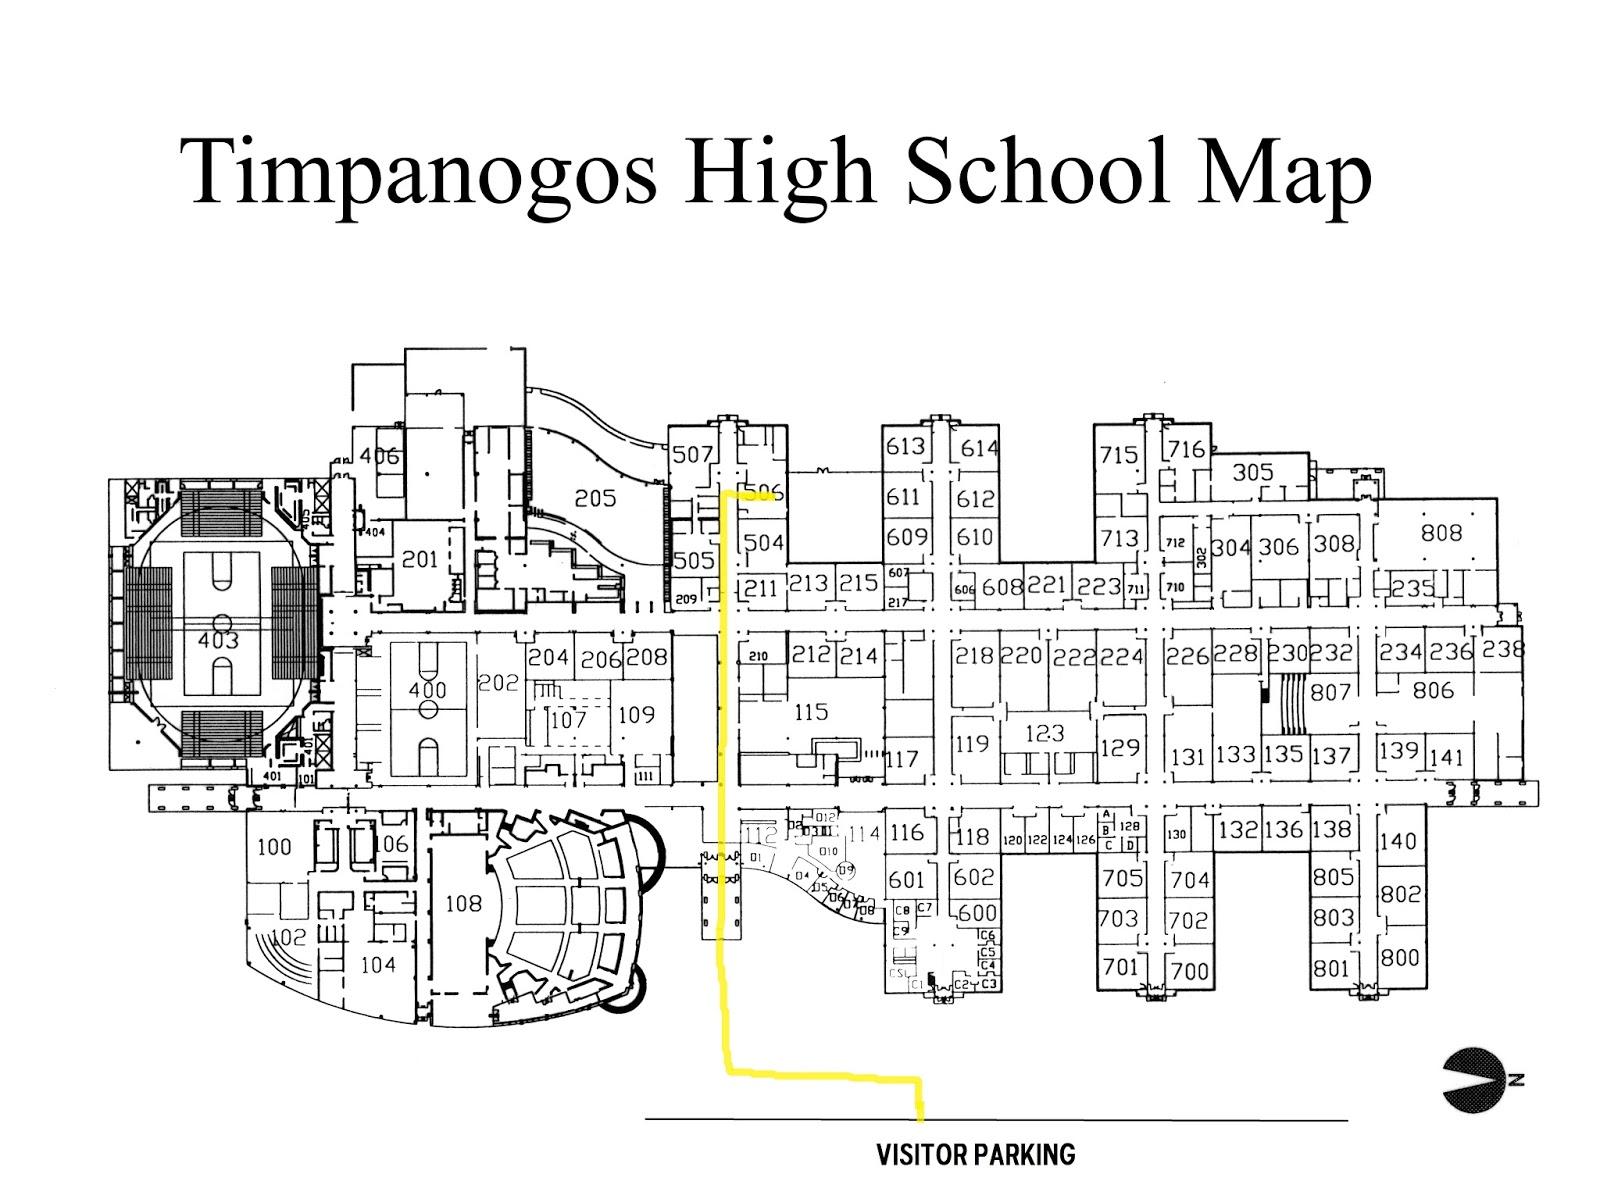 Preschool Classroom Floor Plans Timpanogos Weewolves Childcare Amp Preschool Timpanogos